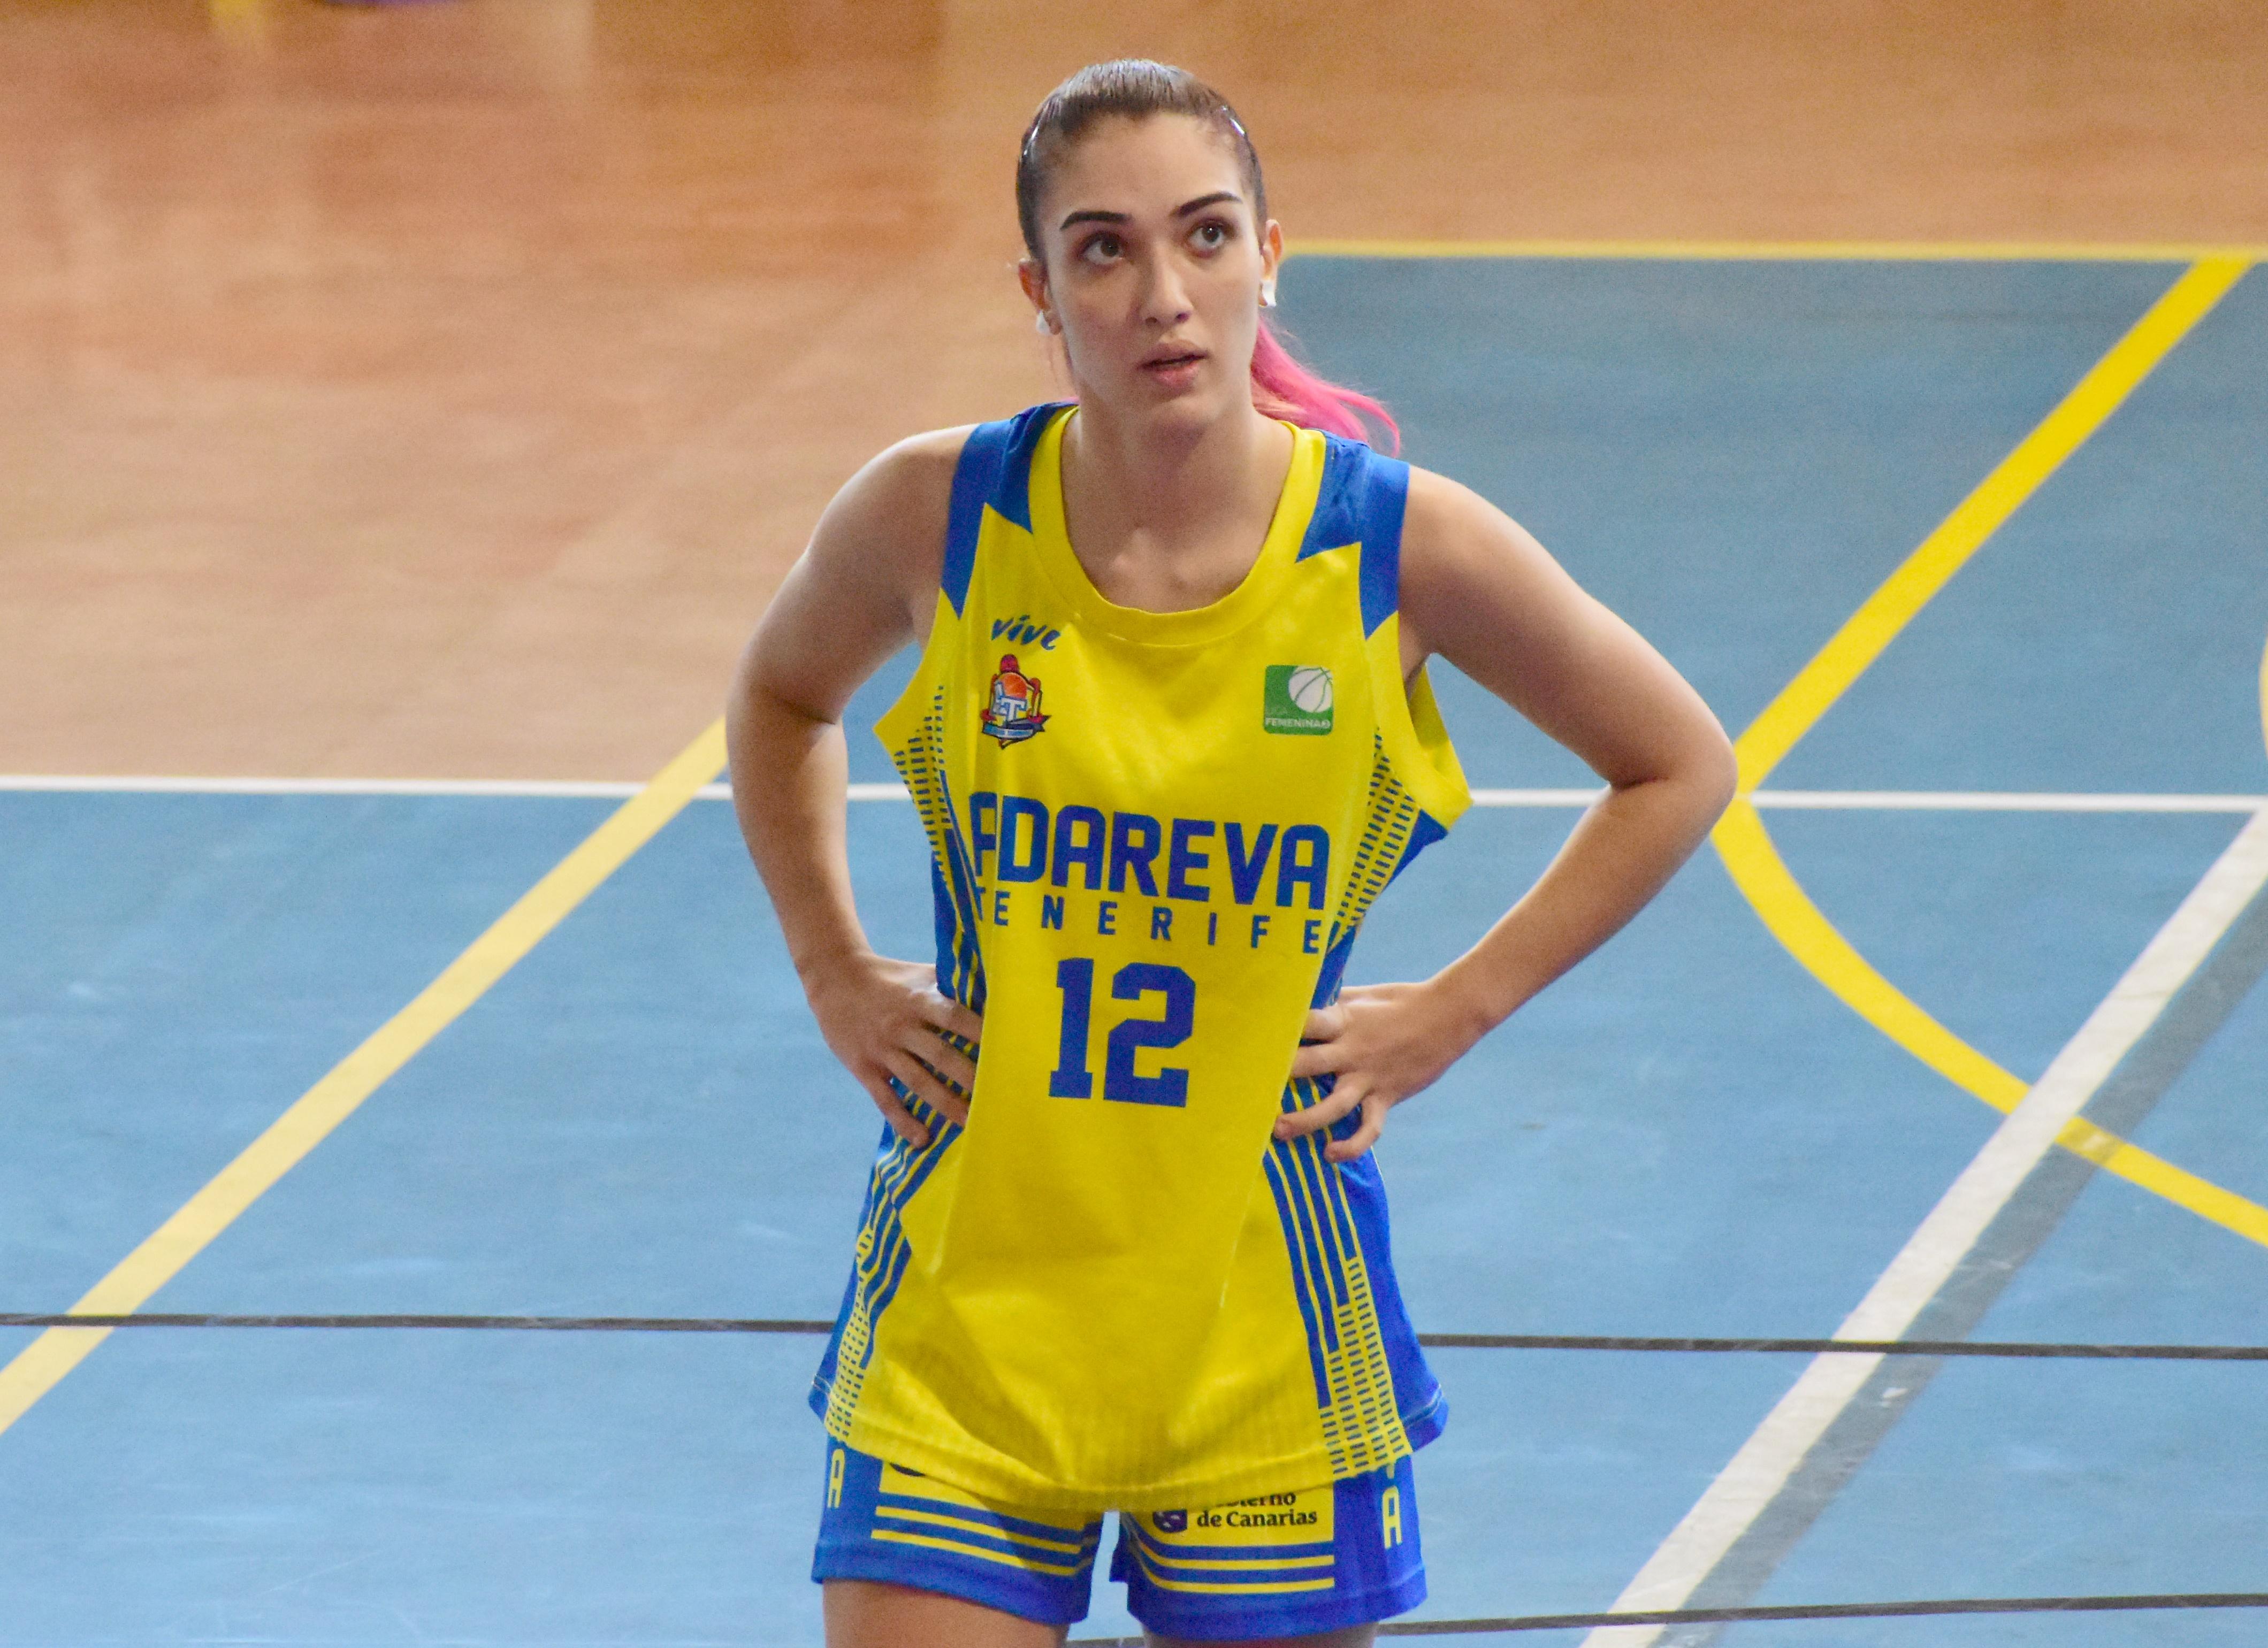 Miriam González regresa al Tenerife Central para aspirar a todo en Primera División Nacional